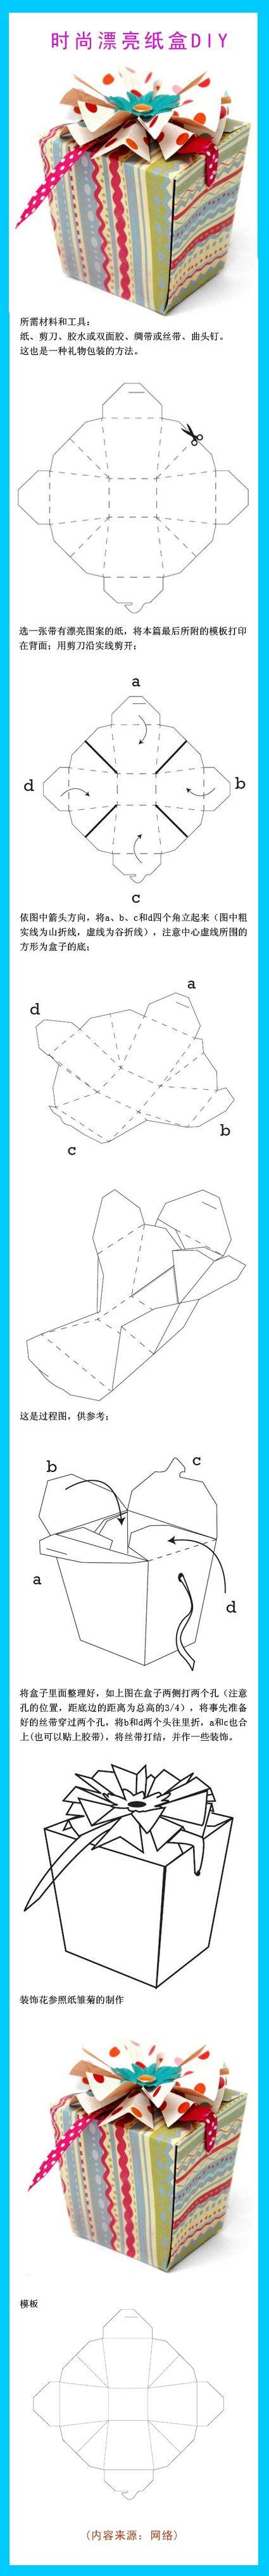 Make your own custom take out box  (Pictorial) 漂亮 的 纸盒 DIY DIY】 手把手教 你 漂亮 时尚 的 纸盒, 包装 礼品 很 赞 哟 ~